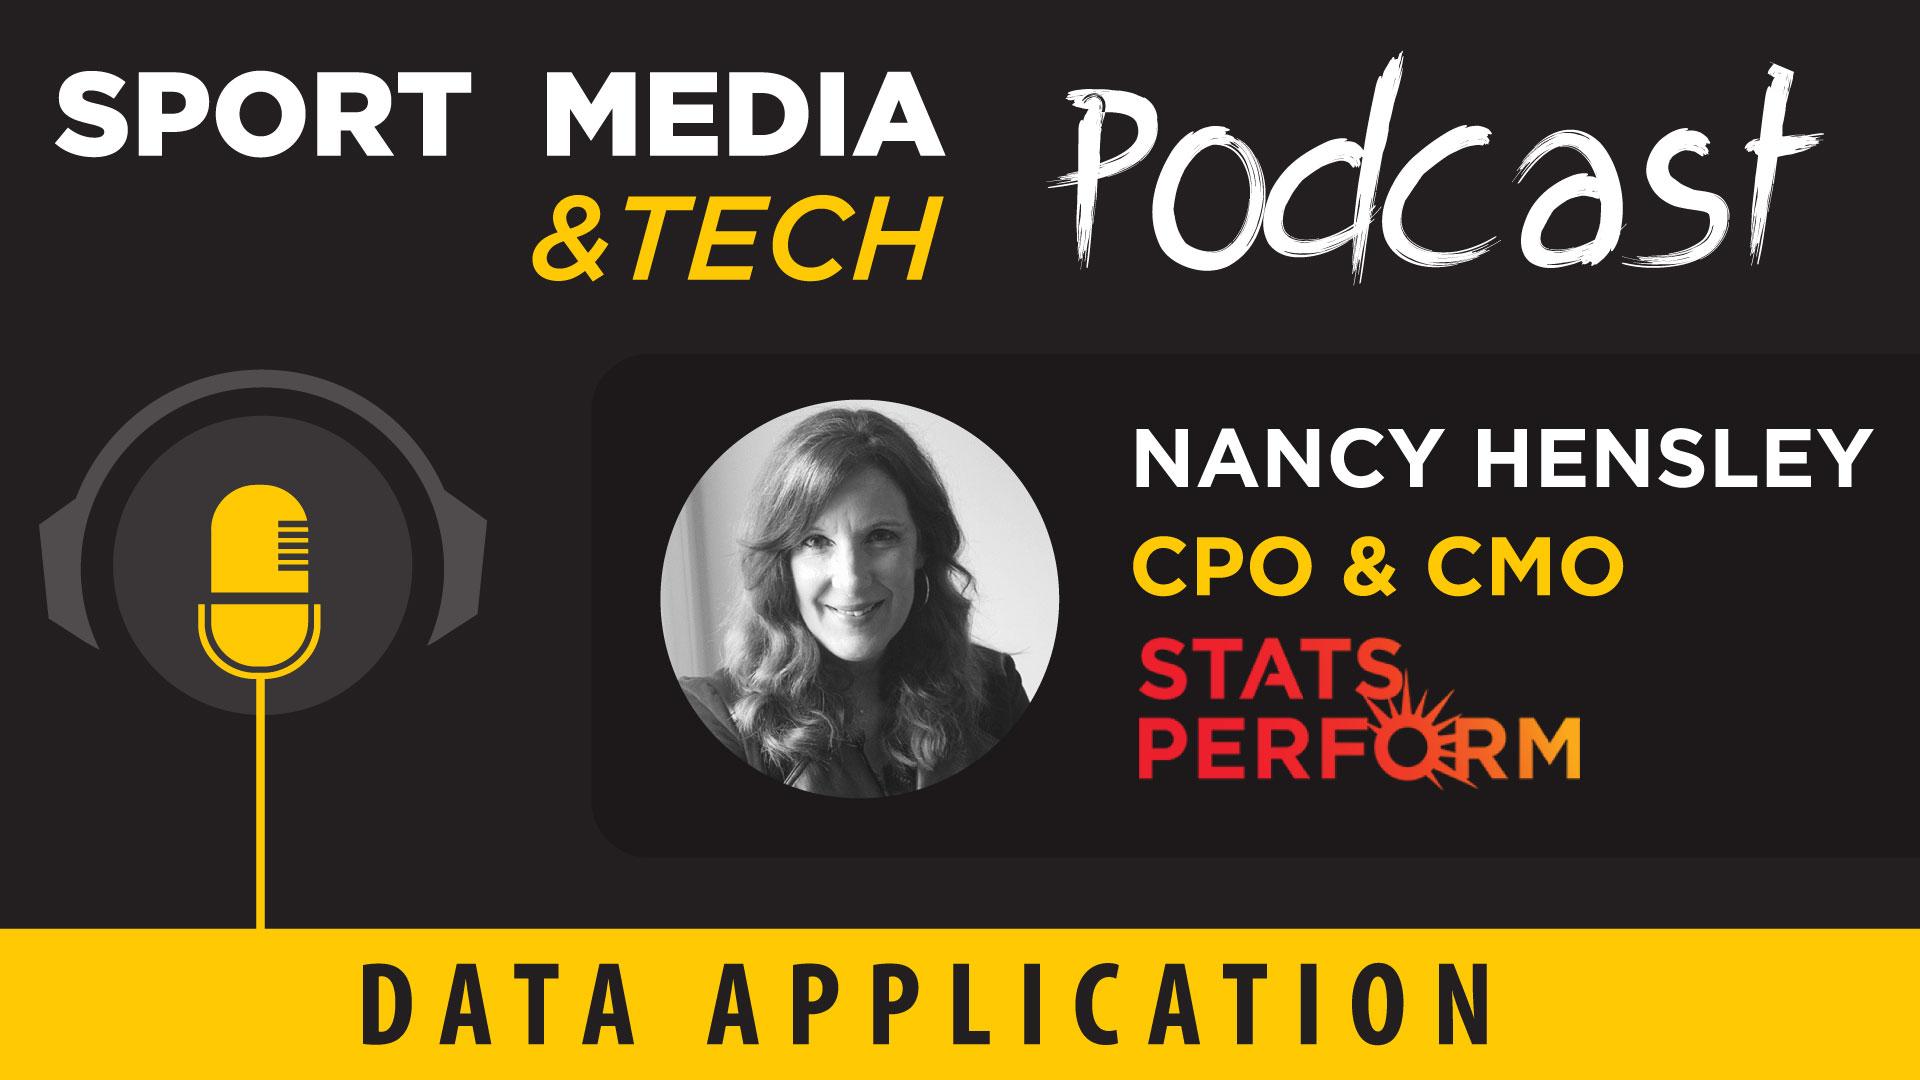 Episode 20: Data Application & Stats Perform